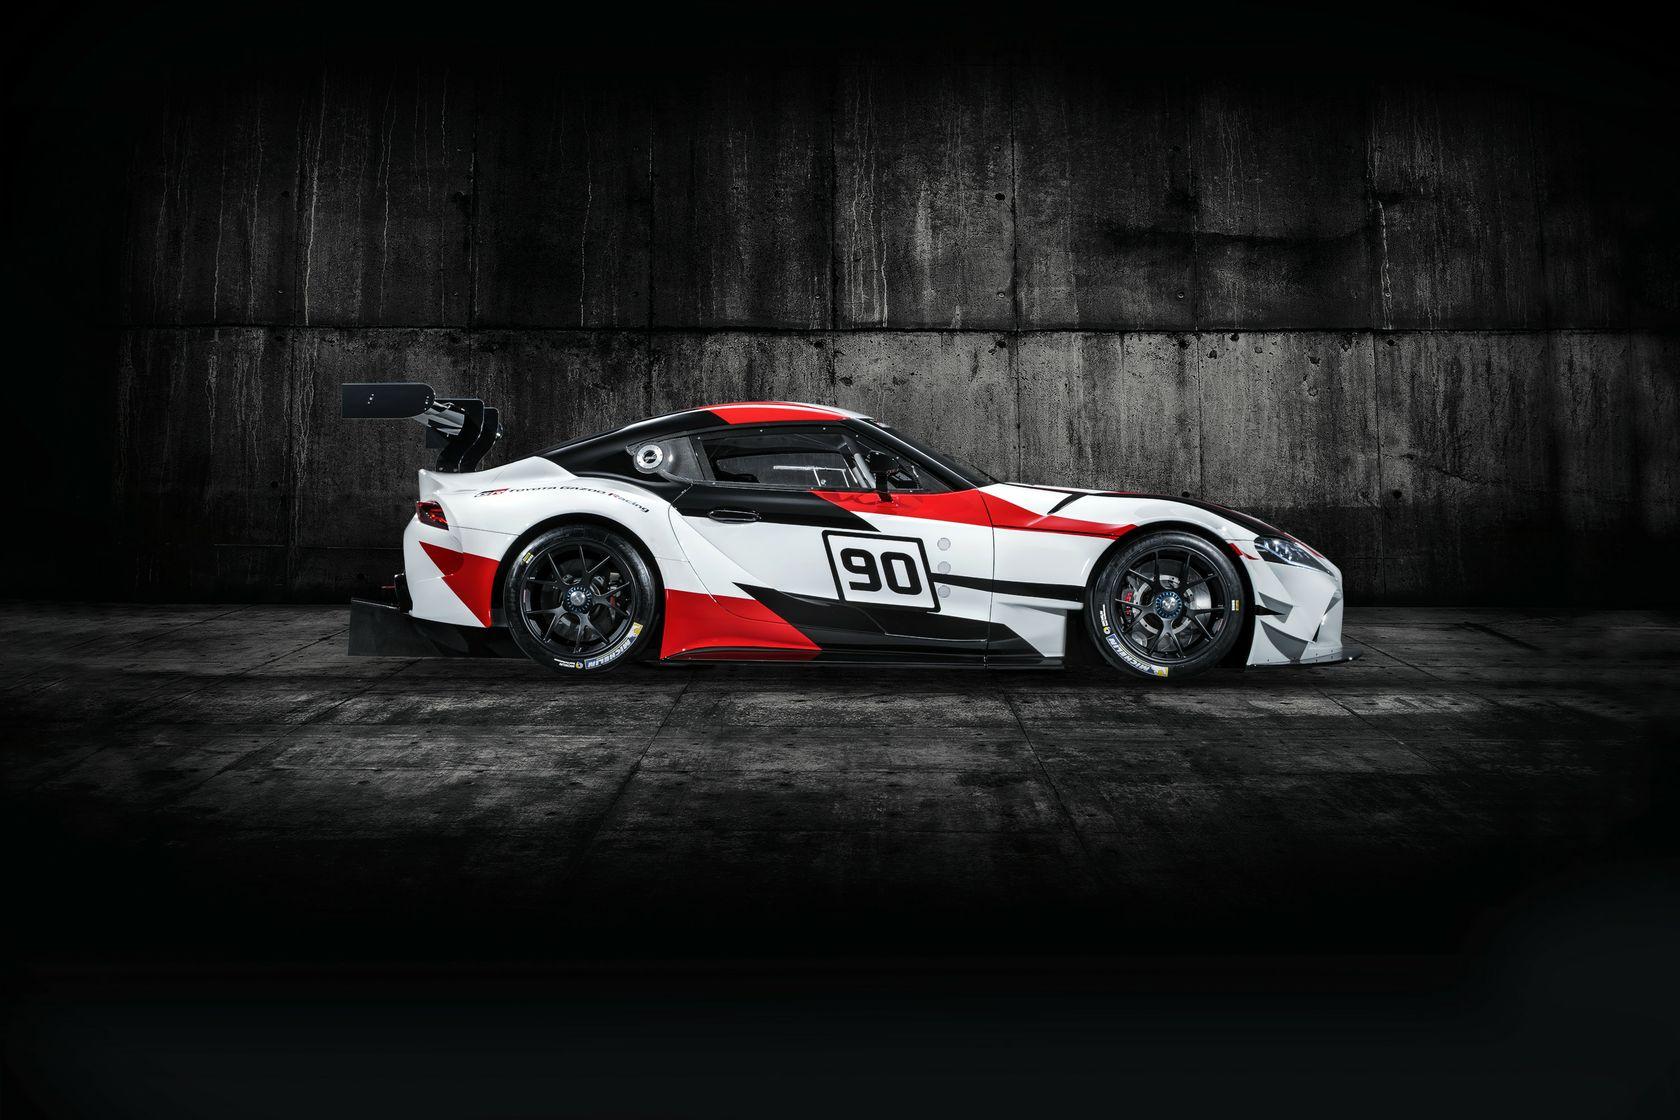 GR Supra Racing Concept - Studio - 06